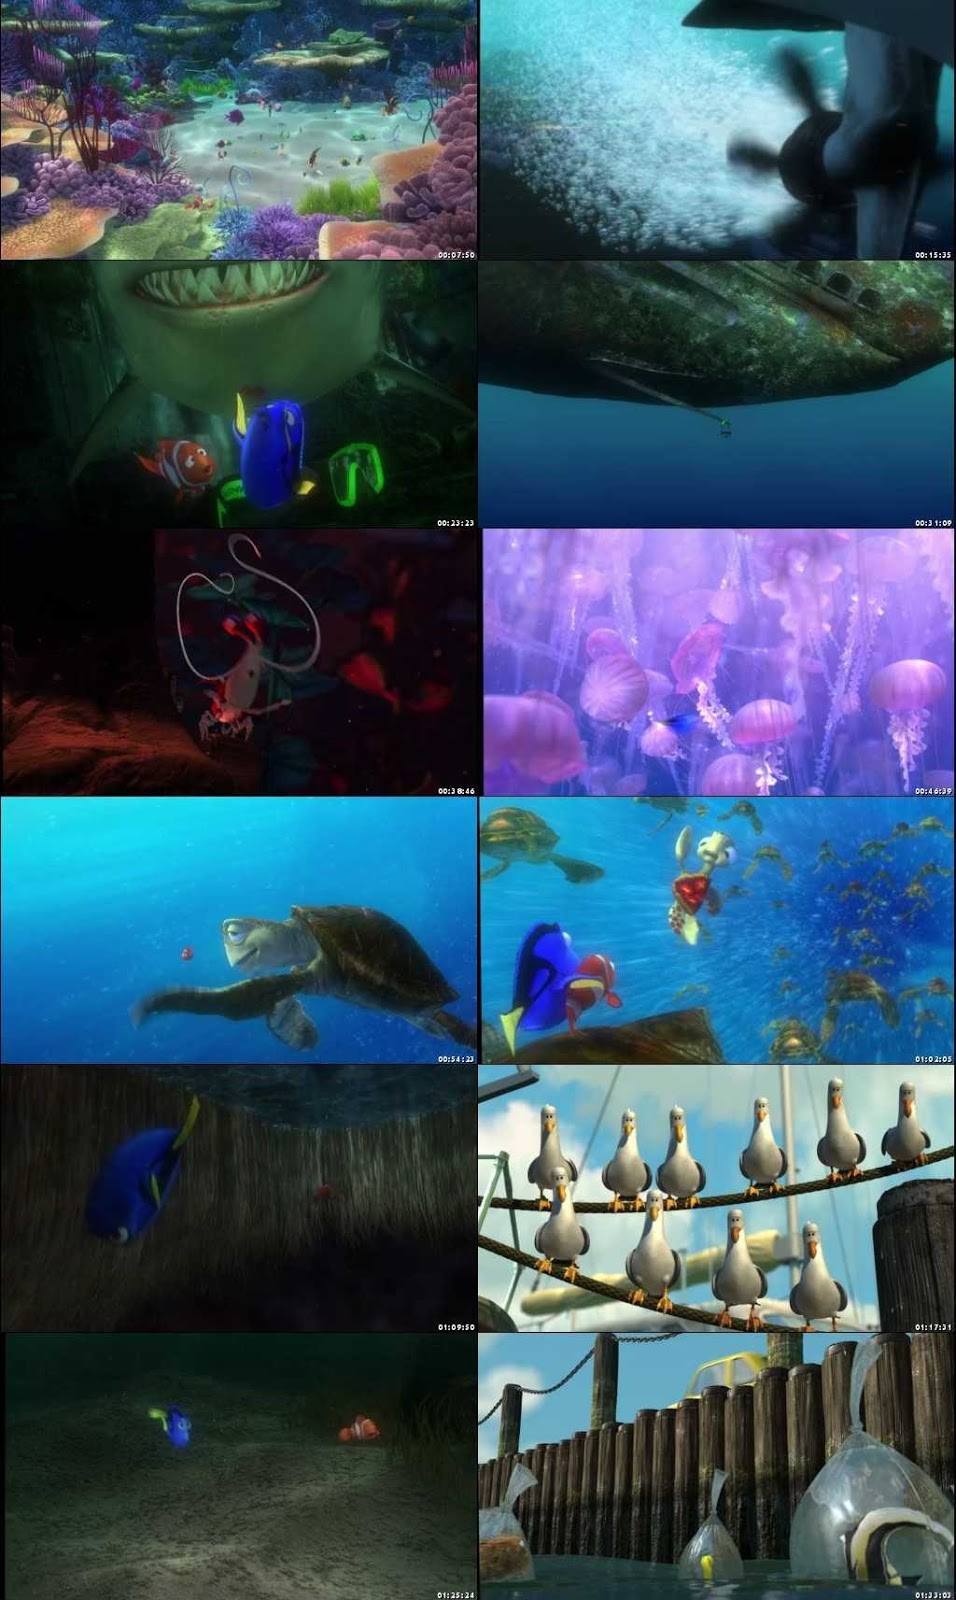 Finding Nemo 2003 screenshot